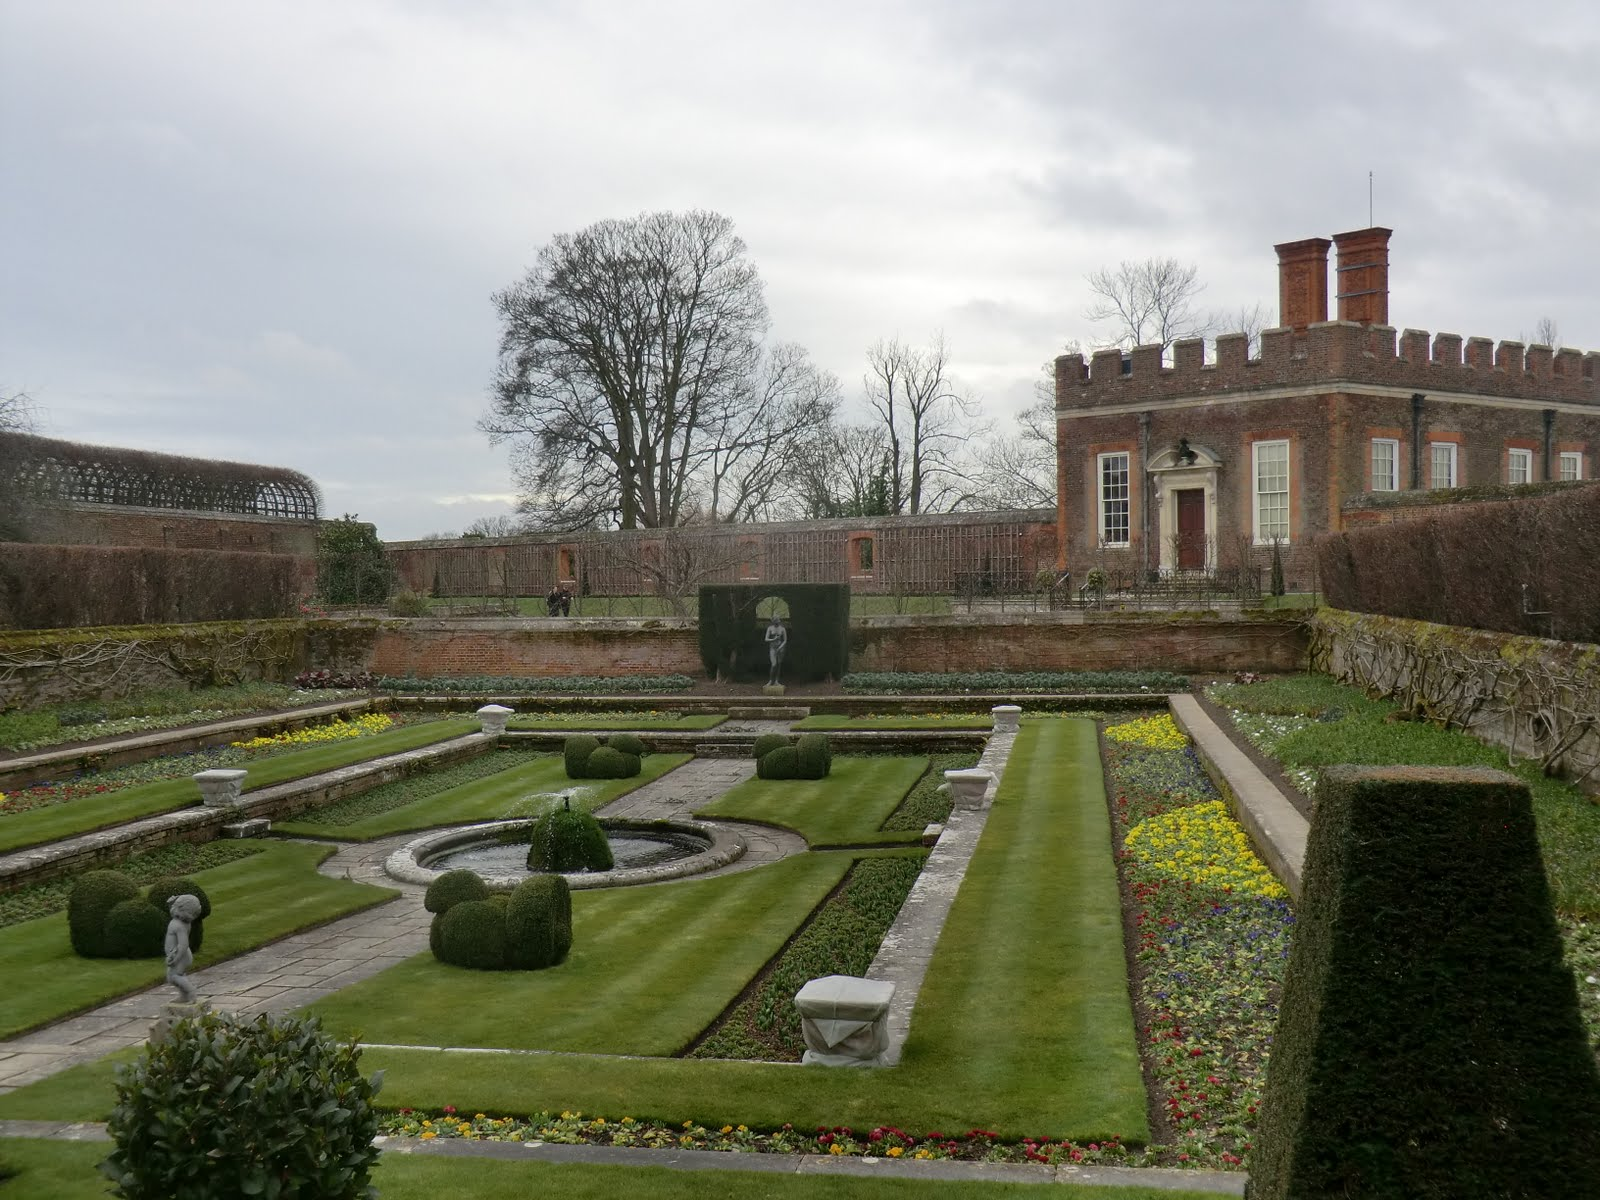 CIMG6886 Pond Garden & Banqueting House, Hampton Court Palace